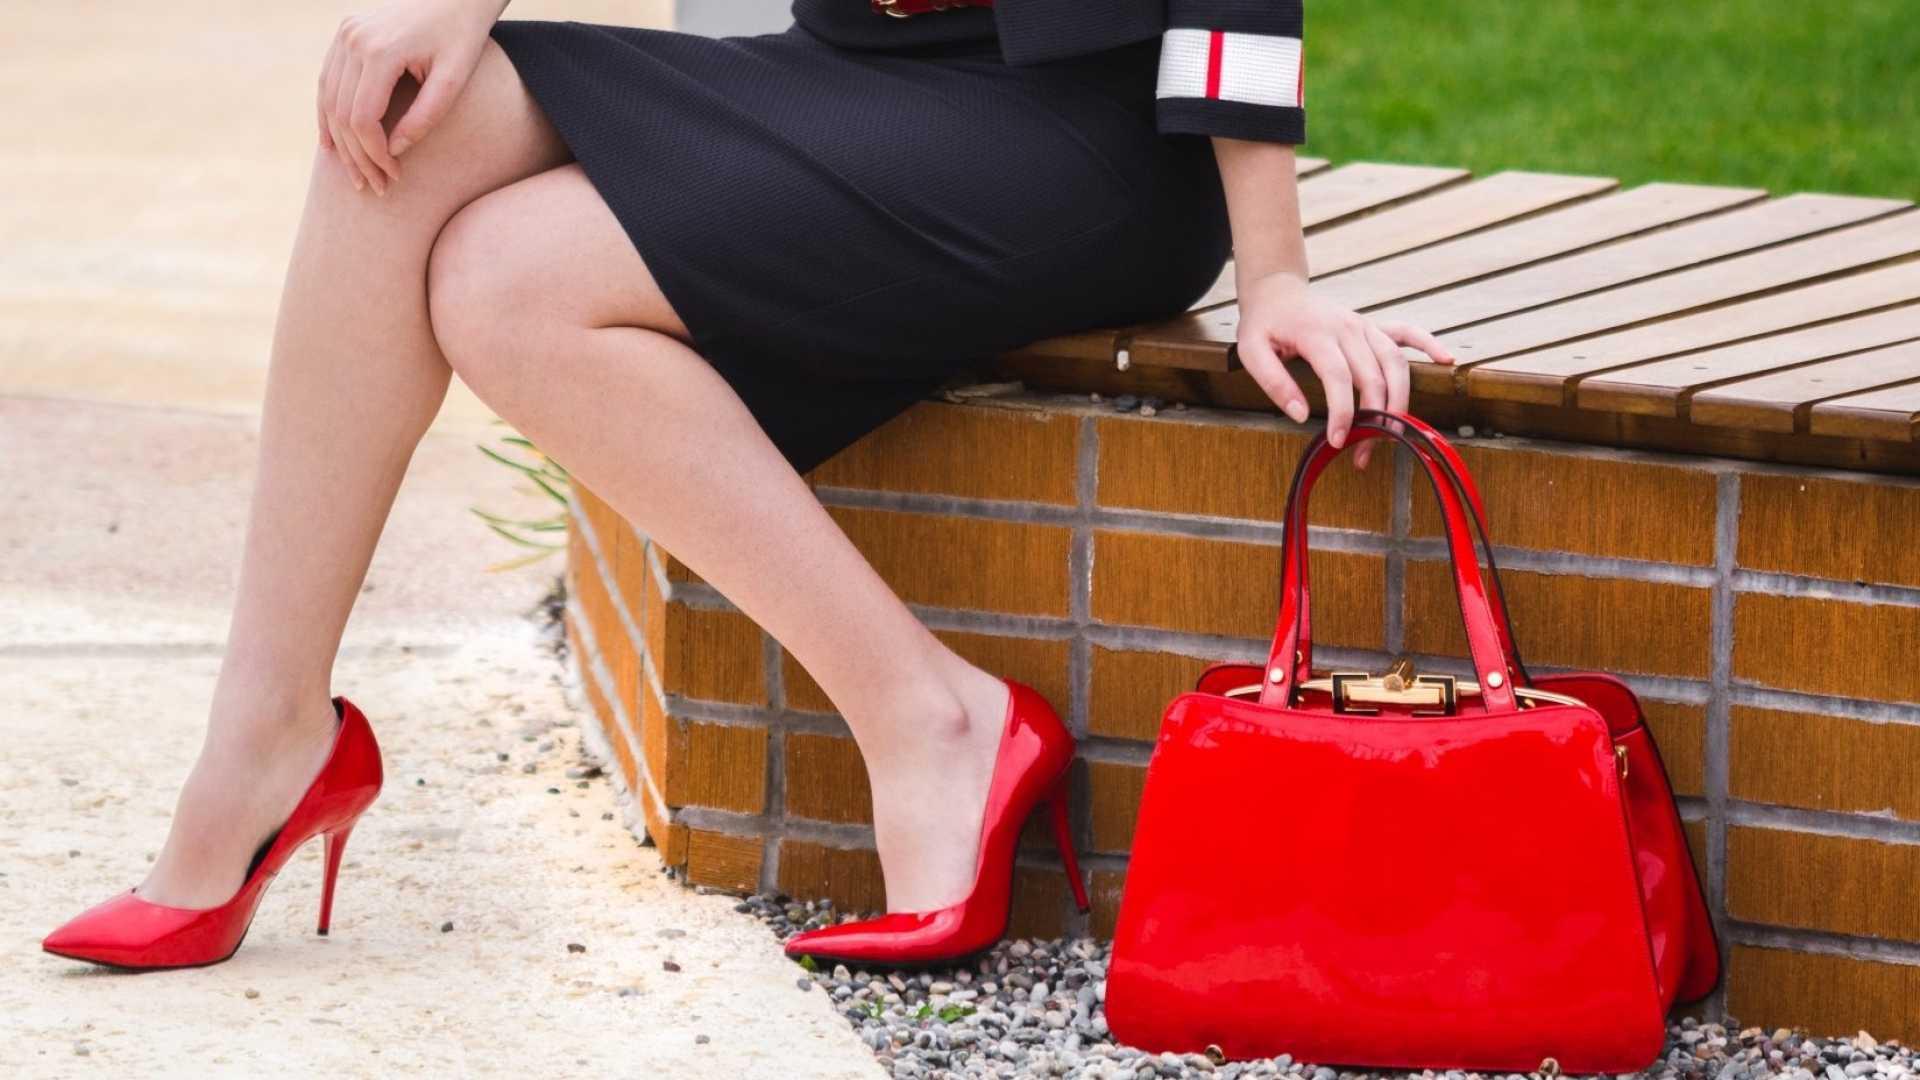 Demystifying Business Attire Part II: Women